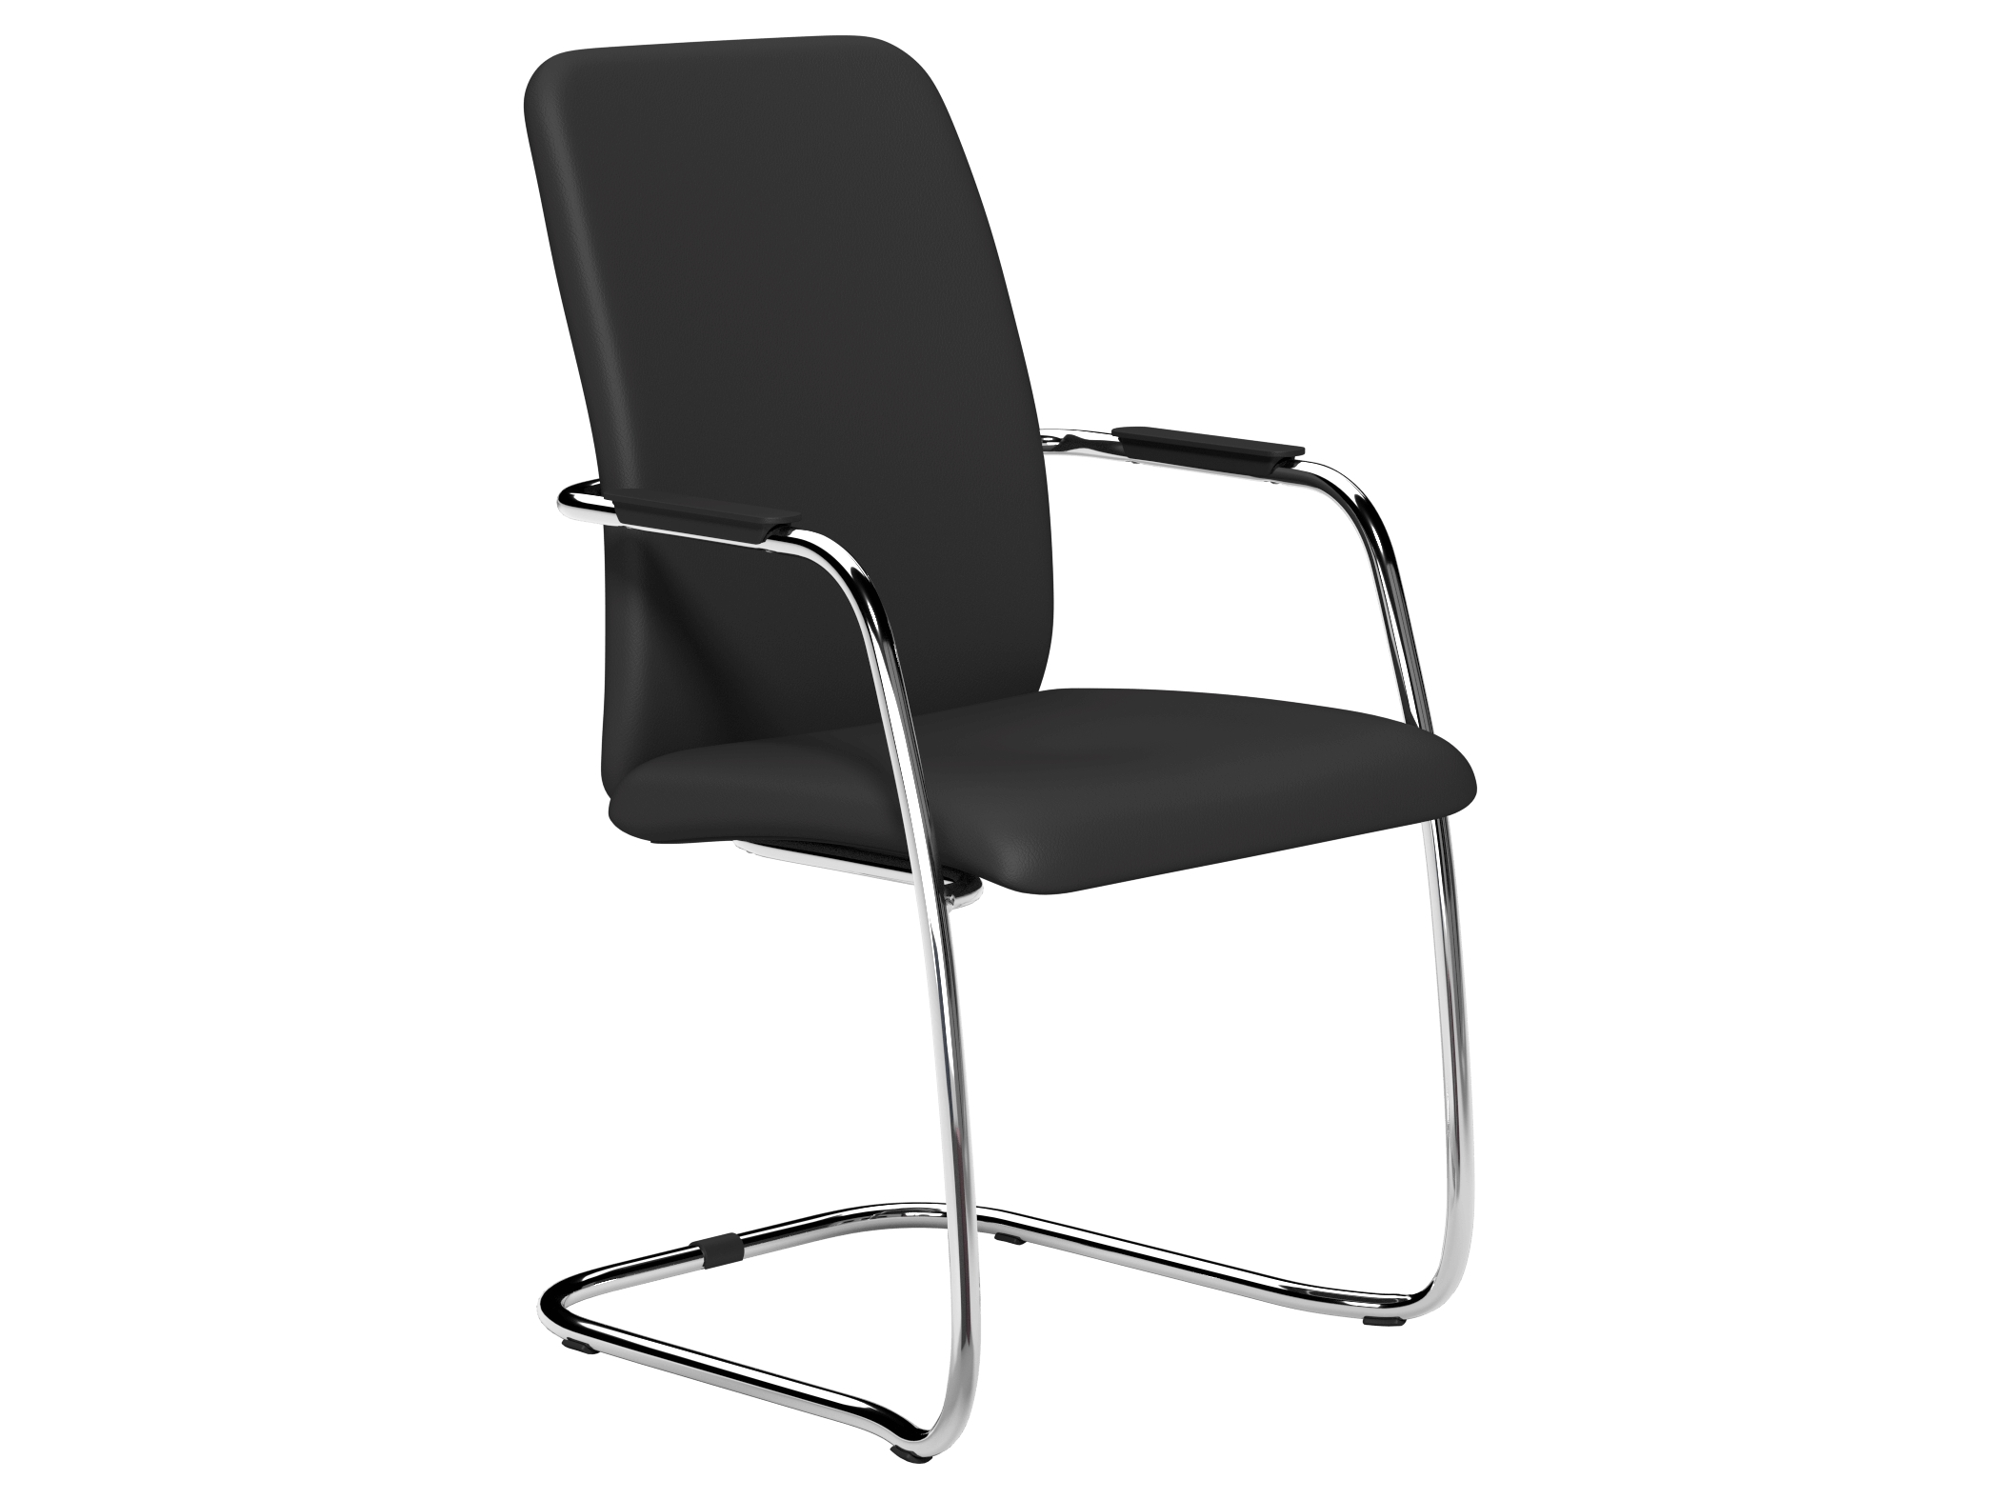 O.Q Series High Back Stacking Chair Chrome - Lotus Black L001